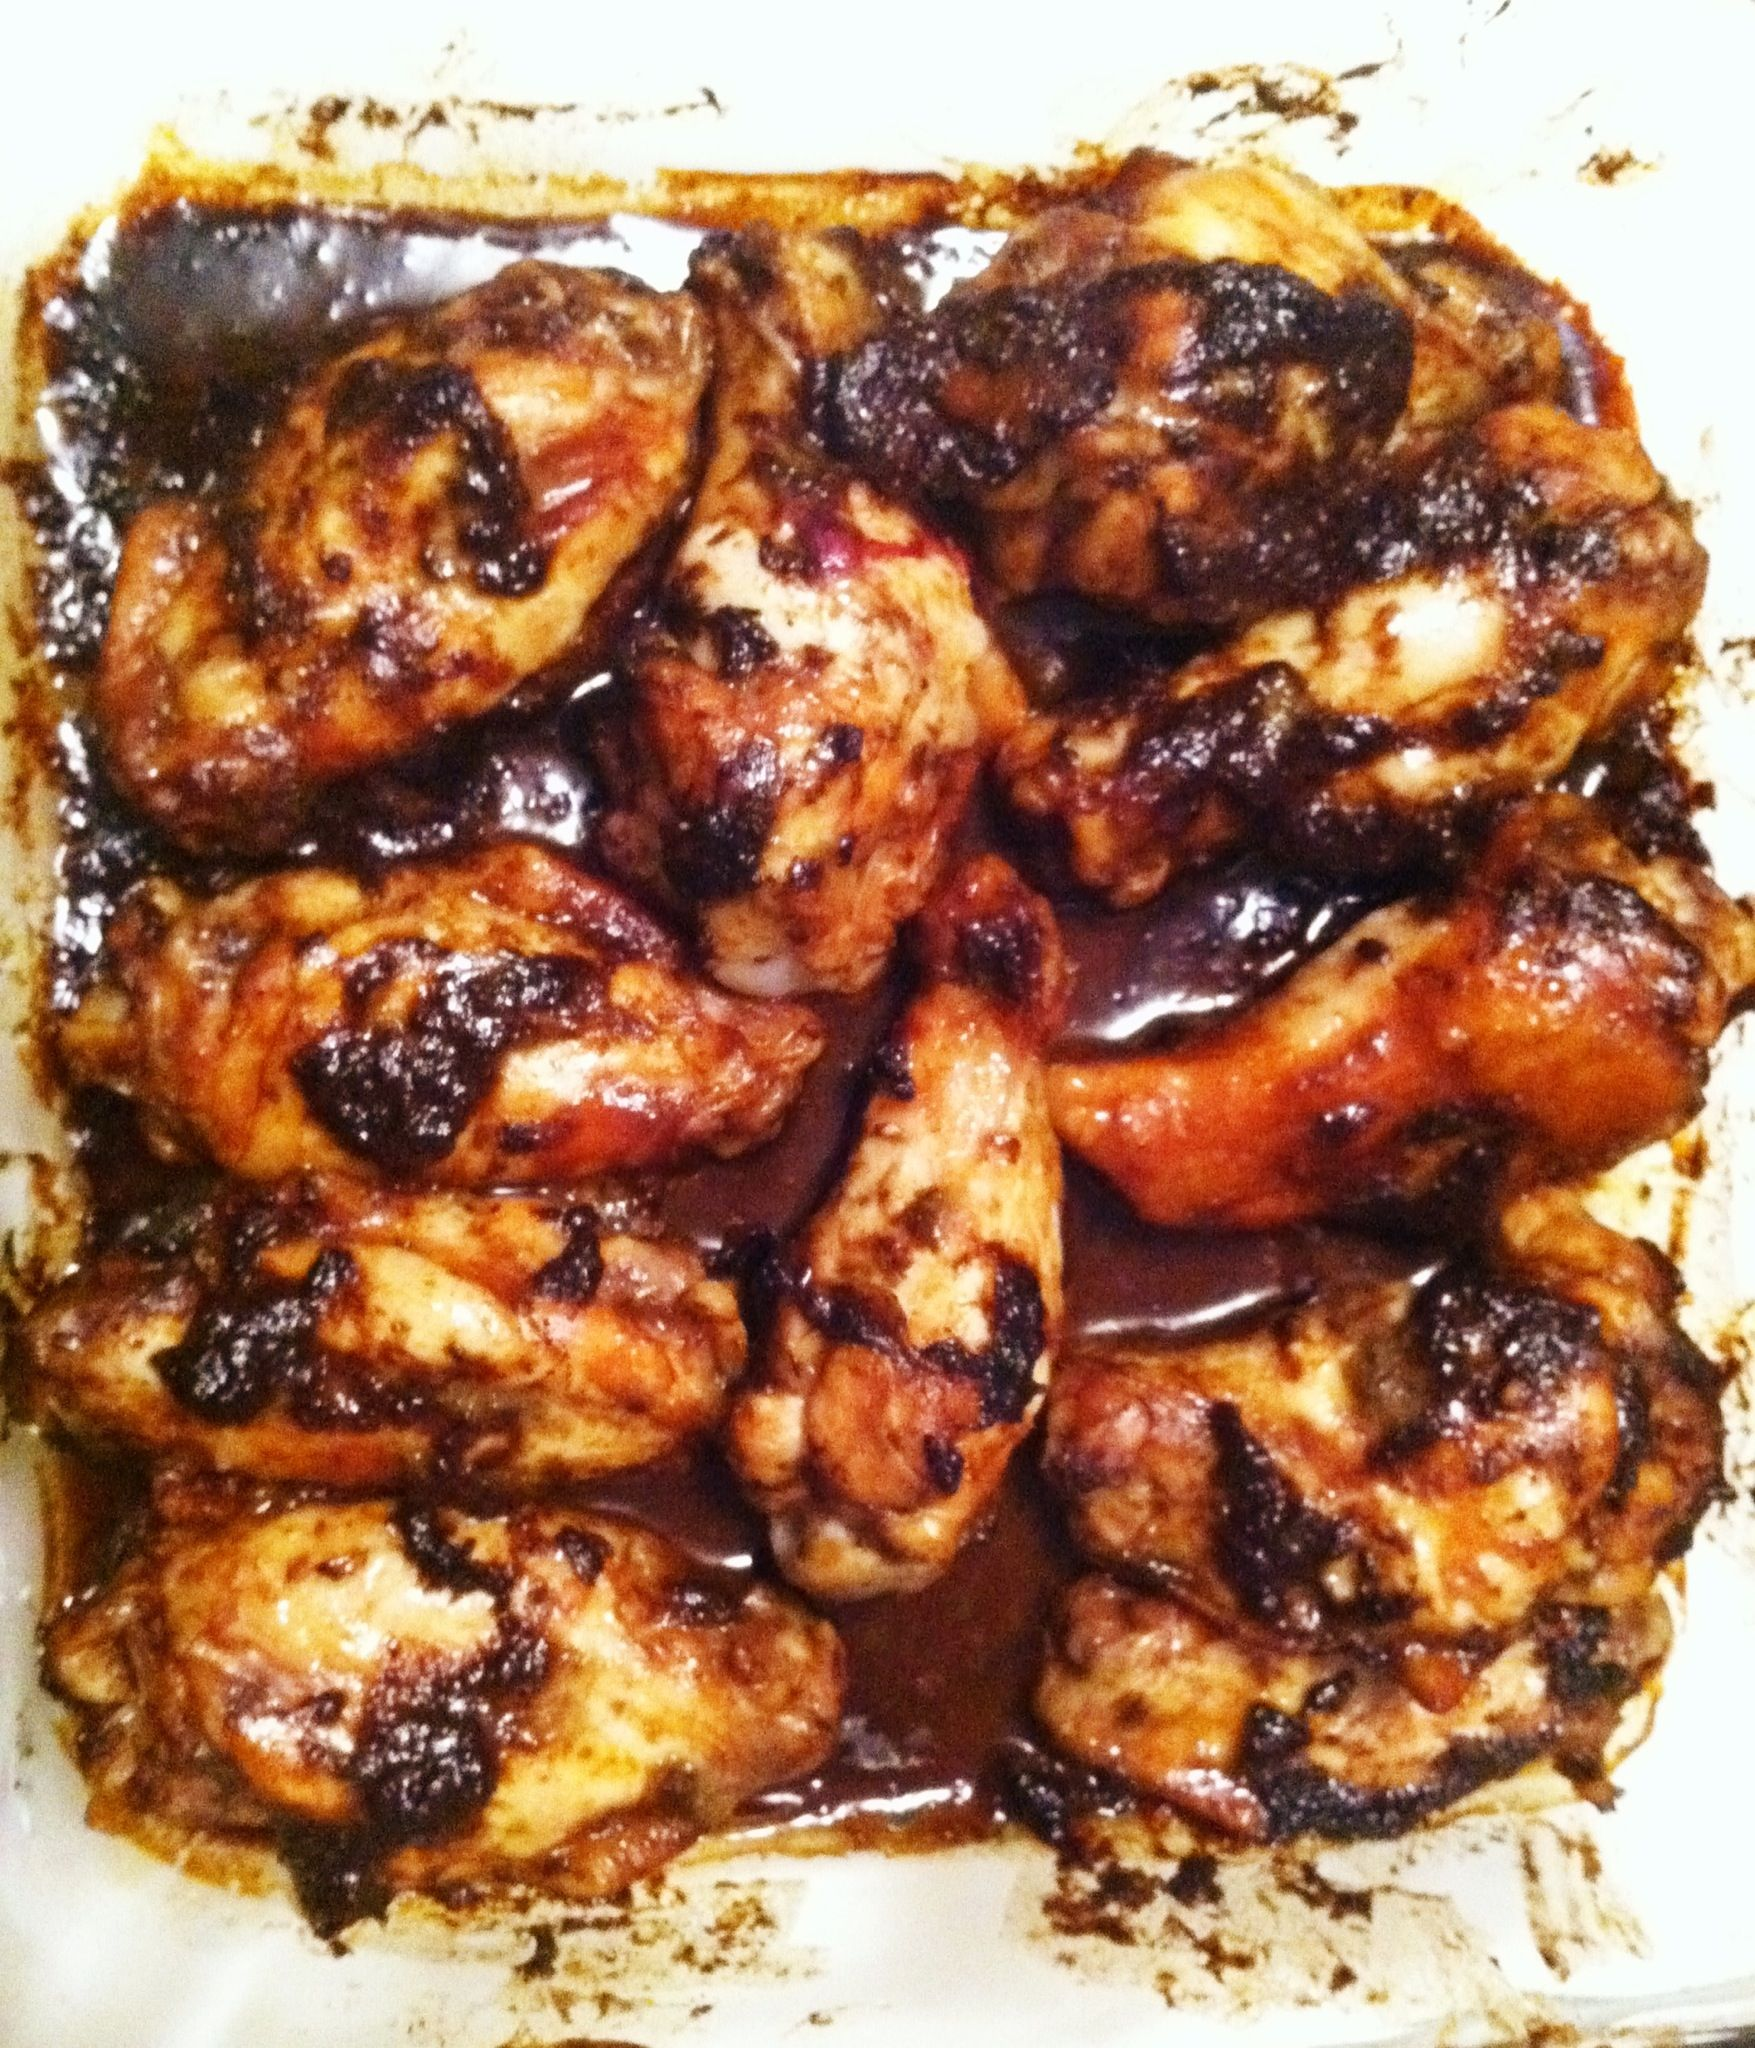 How to make authentic jamaican jerk chicken food pinterest cuisine forumfinder Gallery